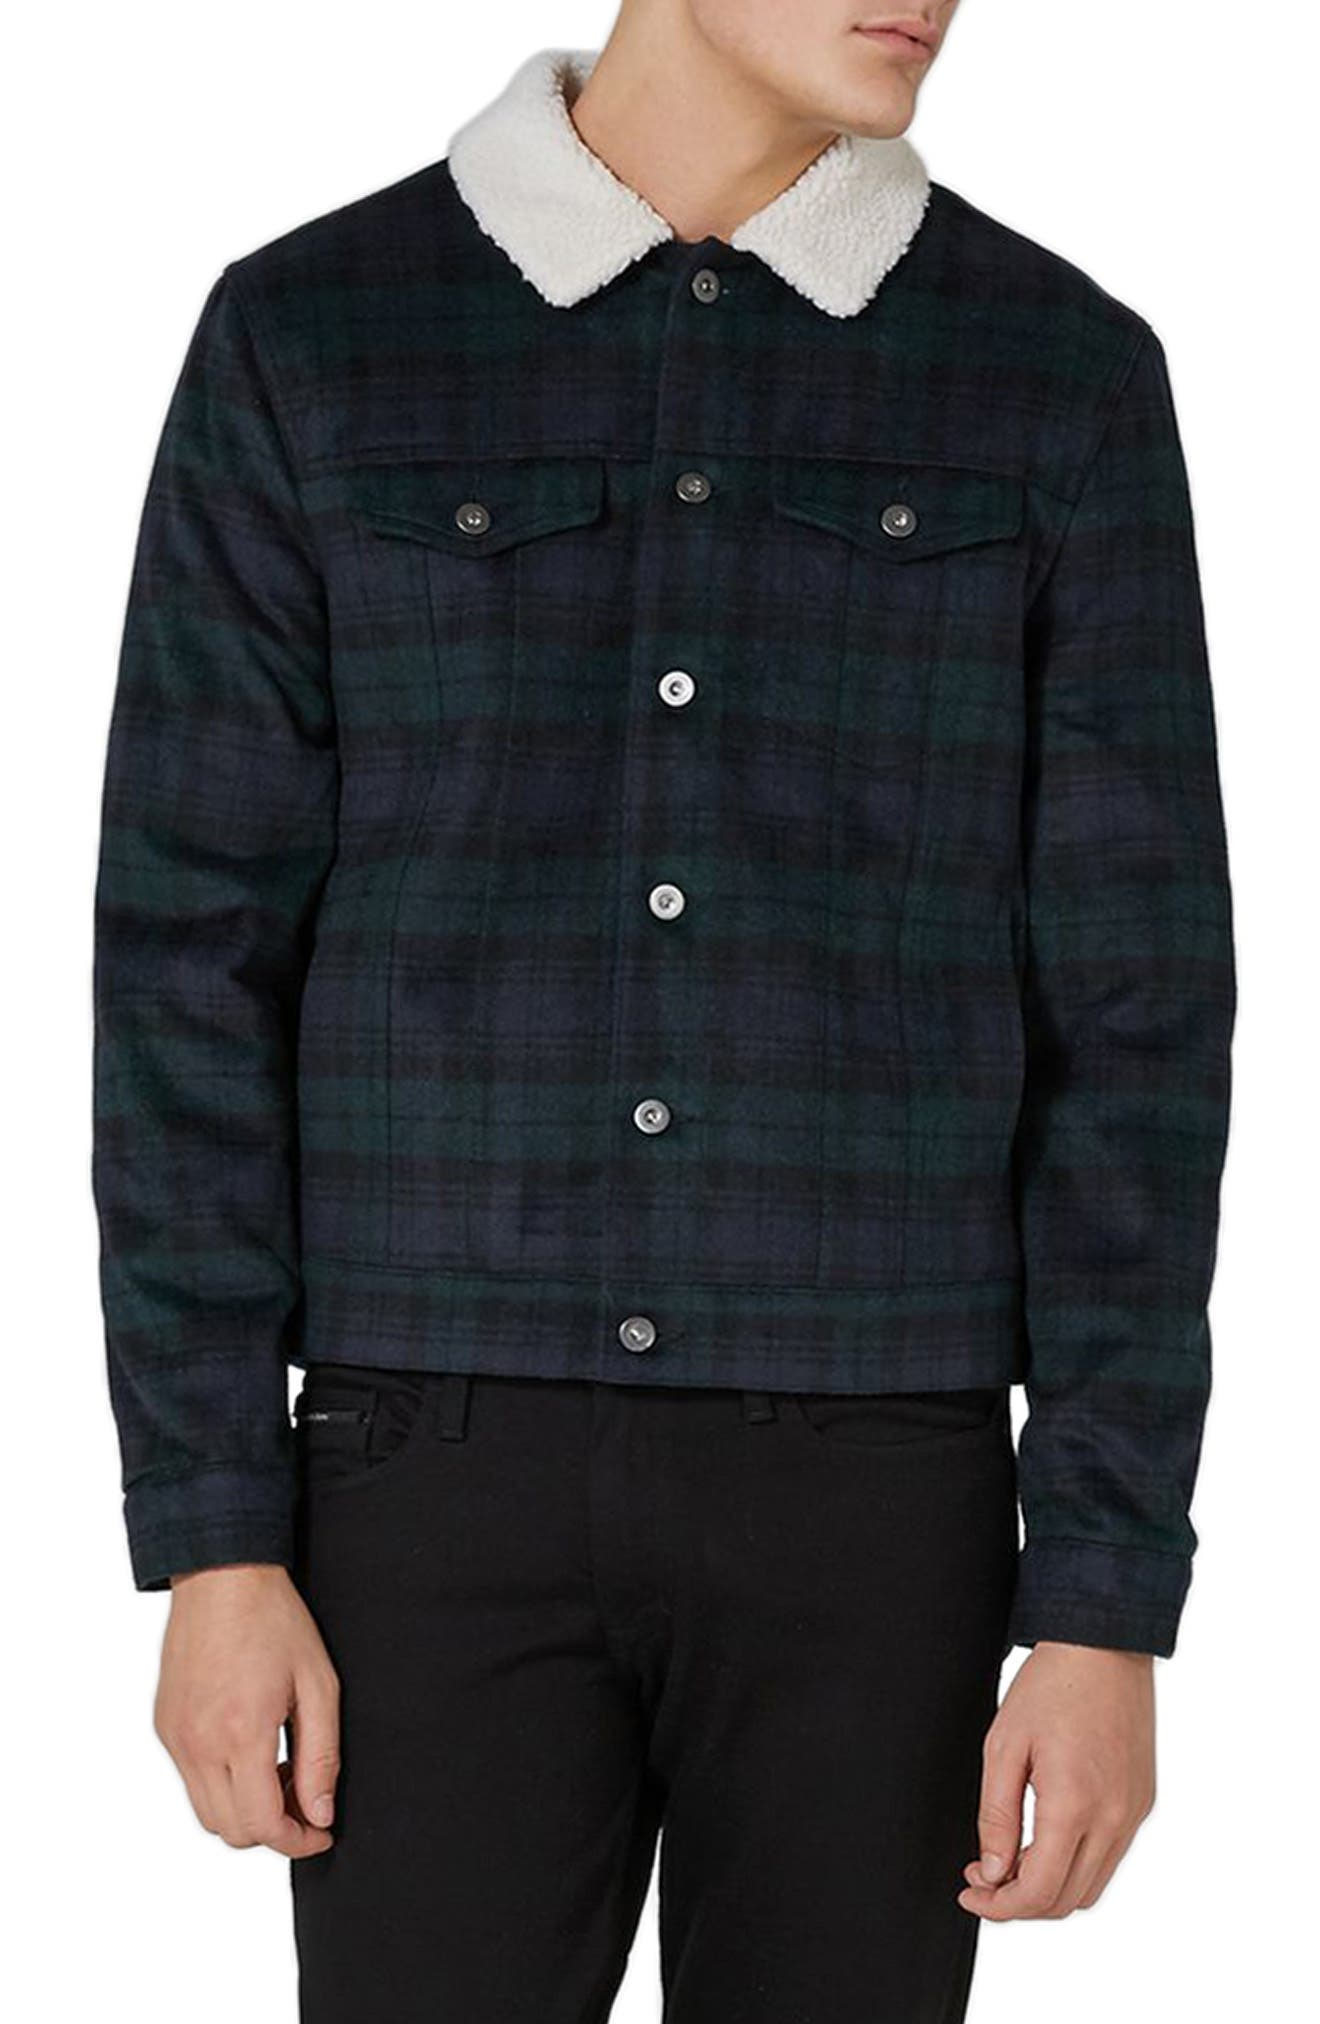 Topman Borg Collar Black Watch Plaid Western Jacket